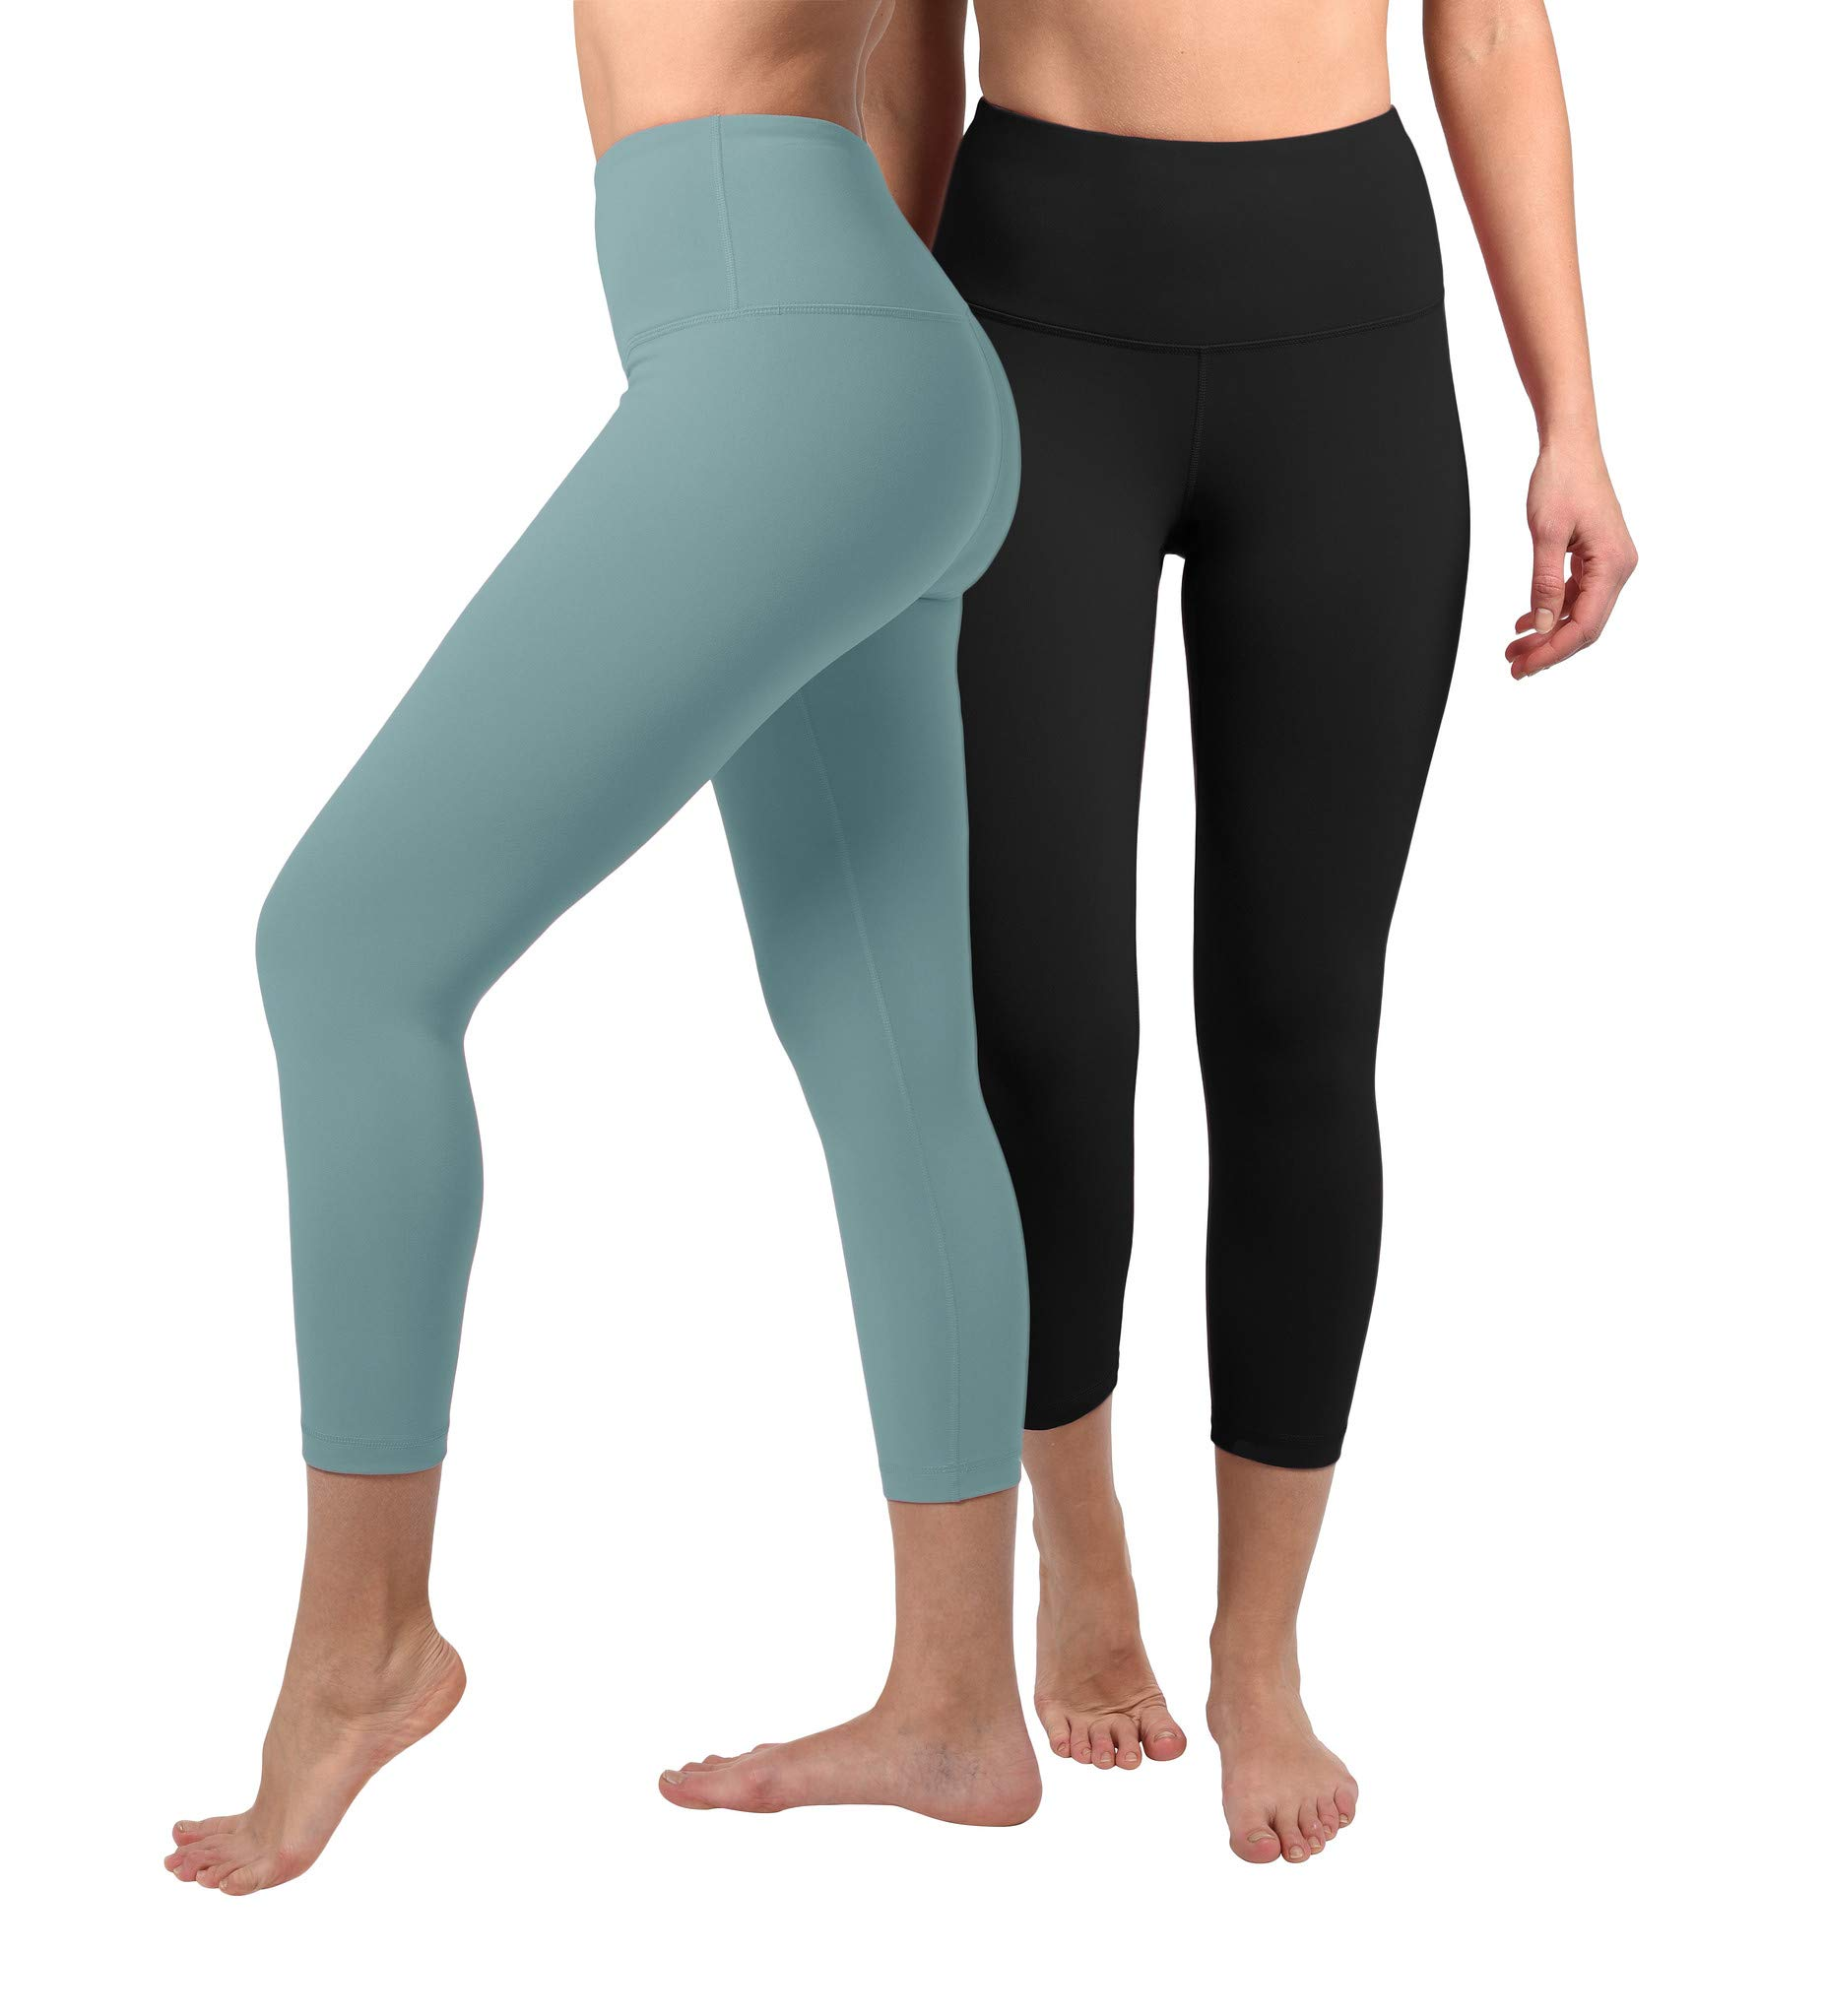 90 Degree By Reflex - High Waist Tummy Control Shapewear - Power Flex Capri - Black and Azure Splash 2 Pack - XL by 90 Degree By Reflex